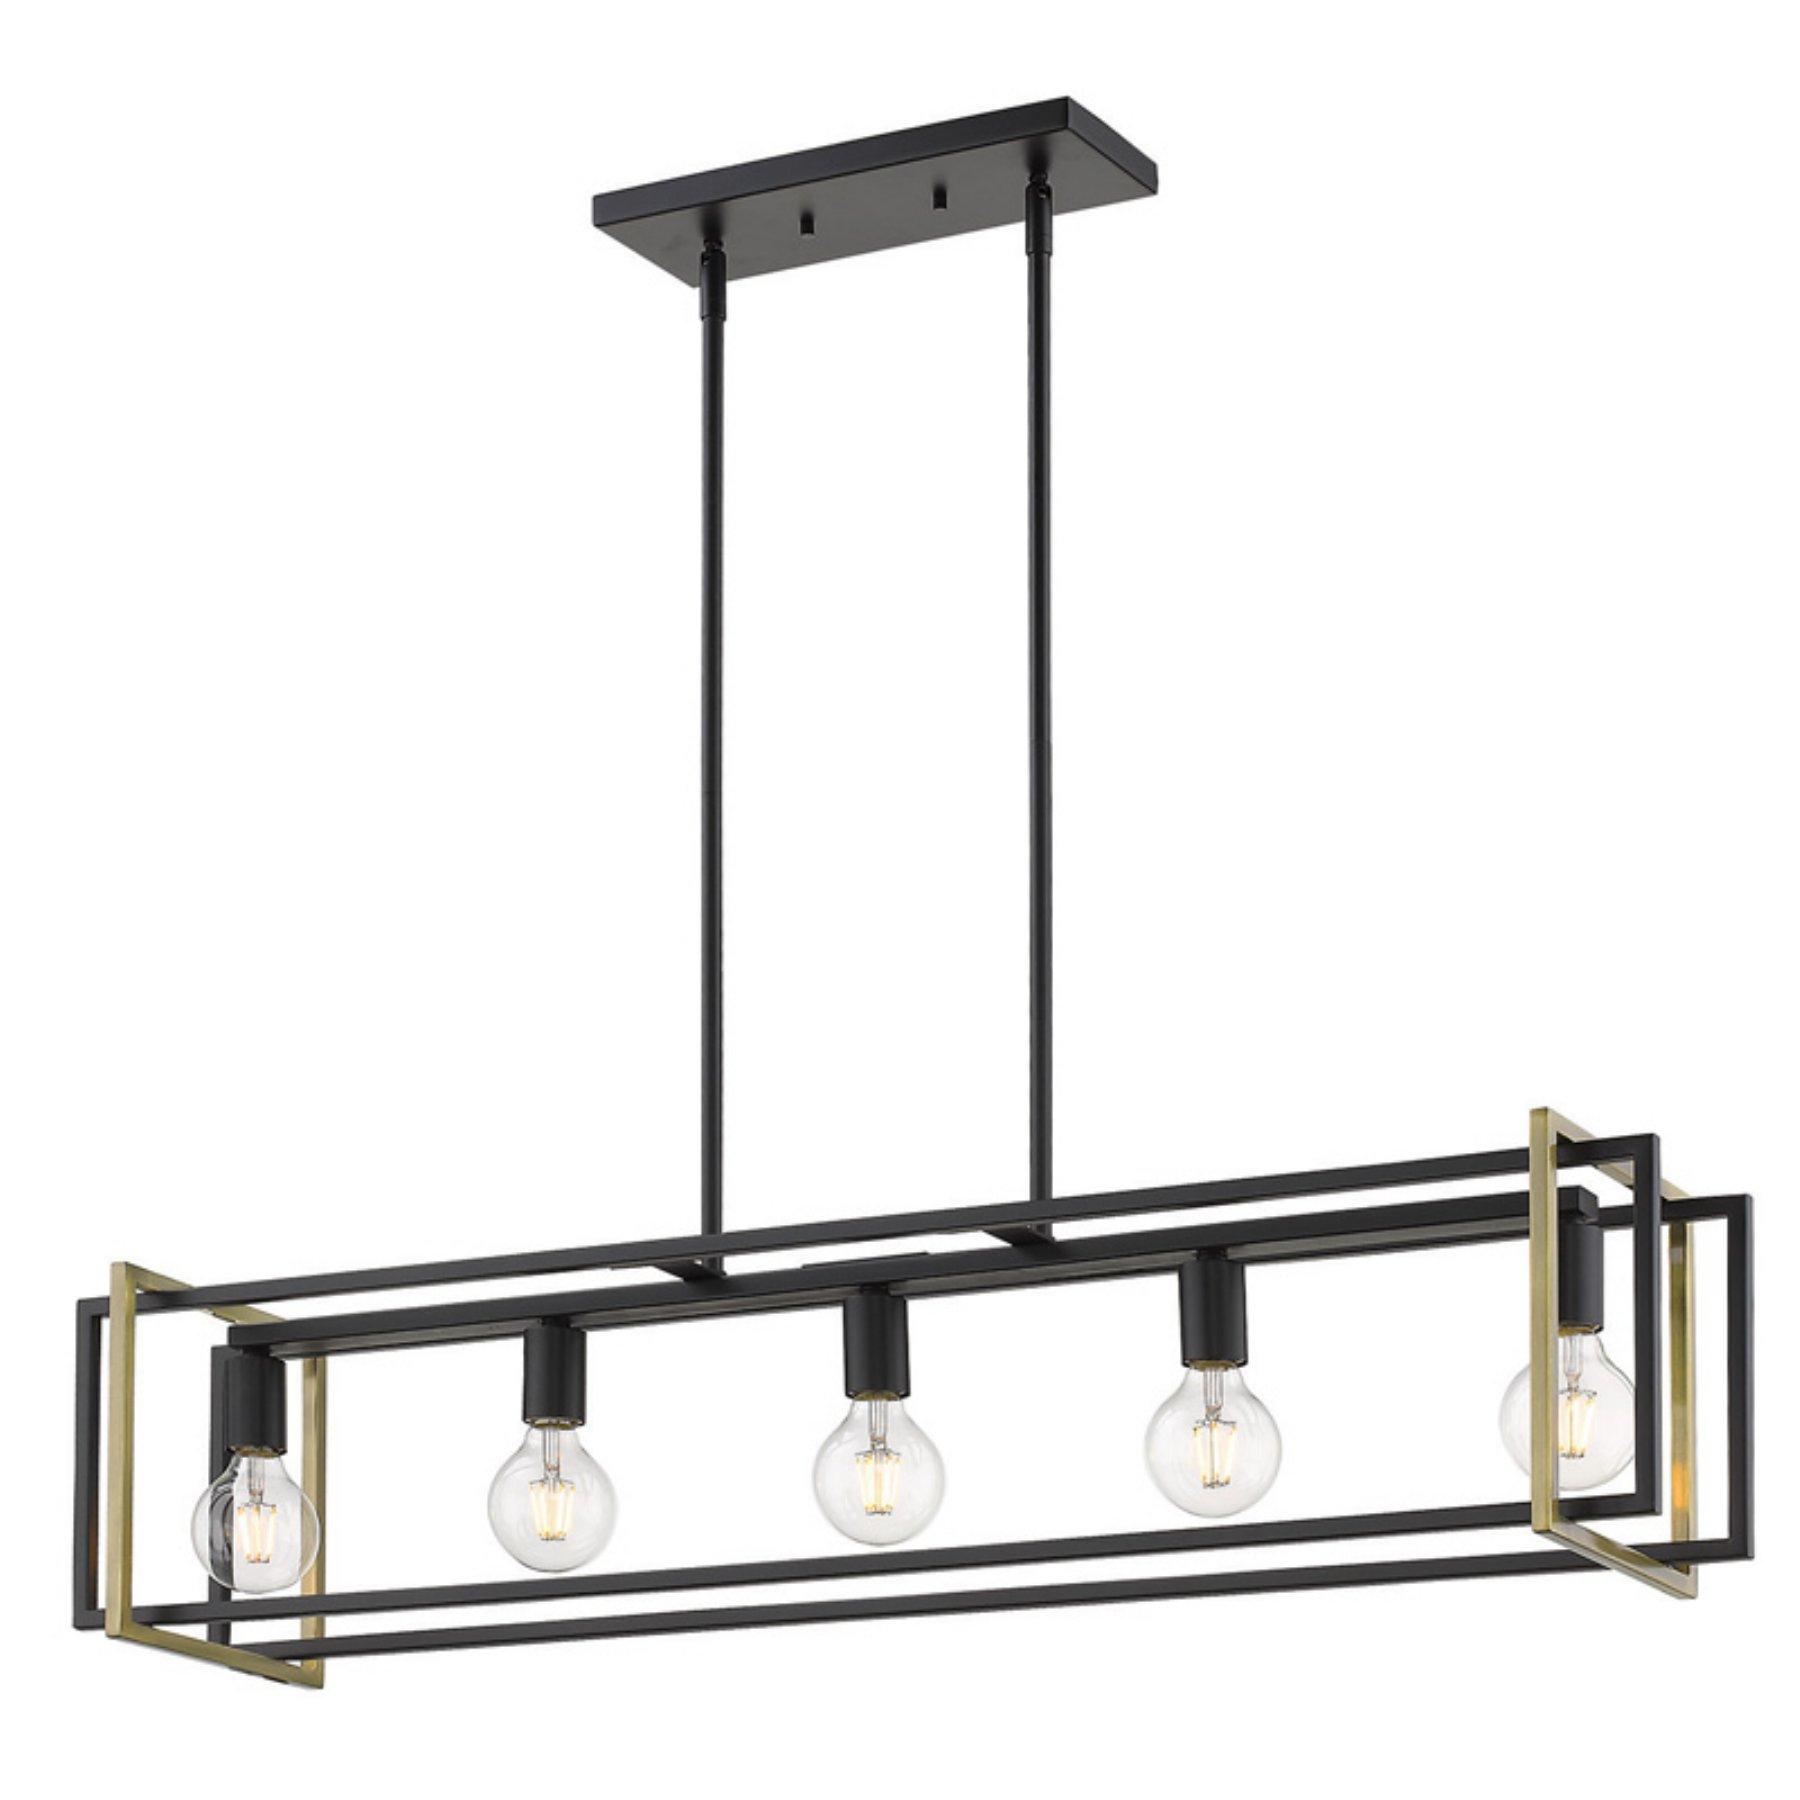 Golden Lighting Tribeca 6070 Lp Linear Pendant Light Within Bouvet 5 Light Kitchen Island Linear Pendants (View 19 of 30)